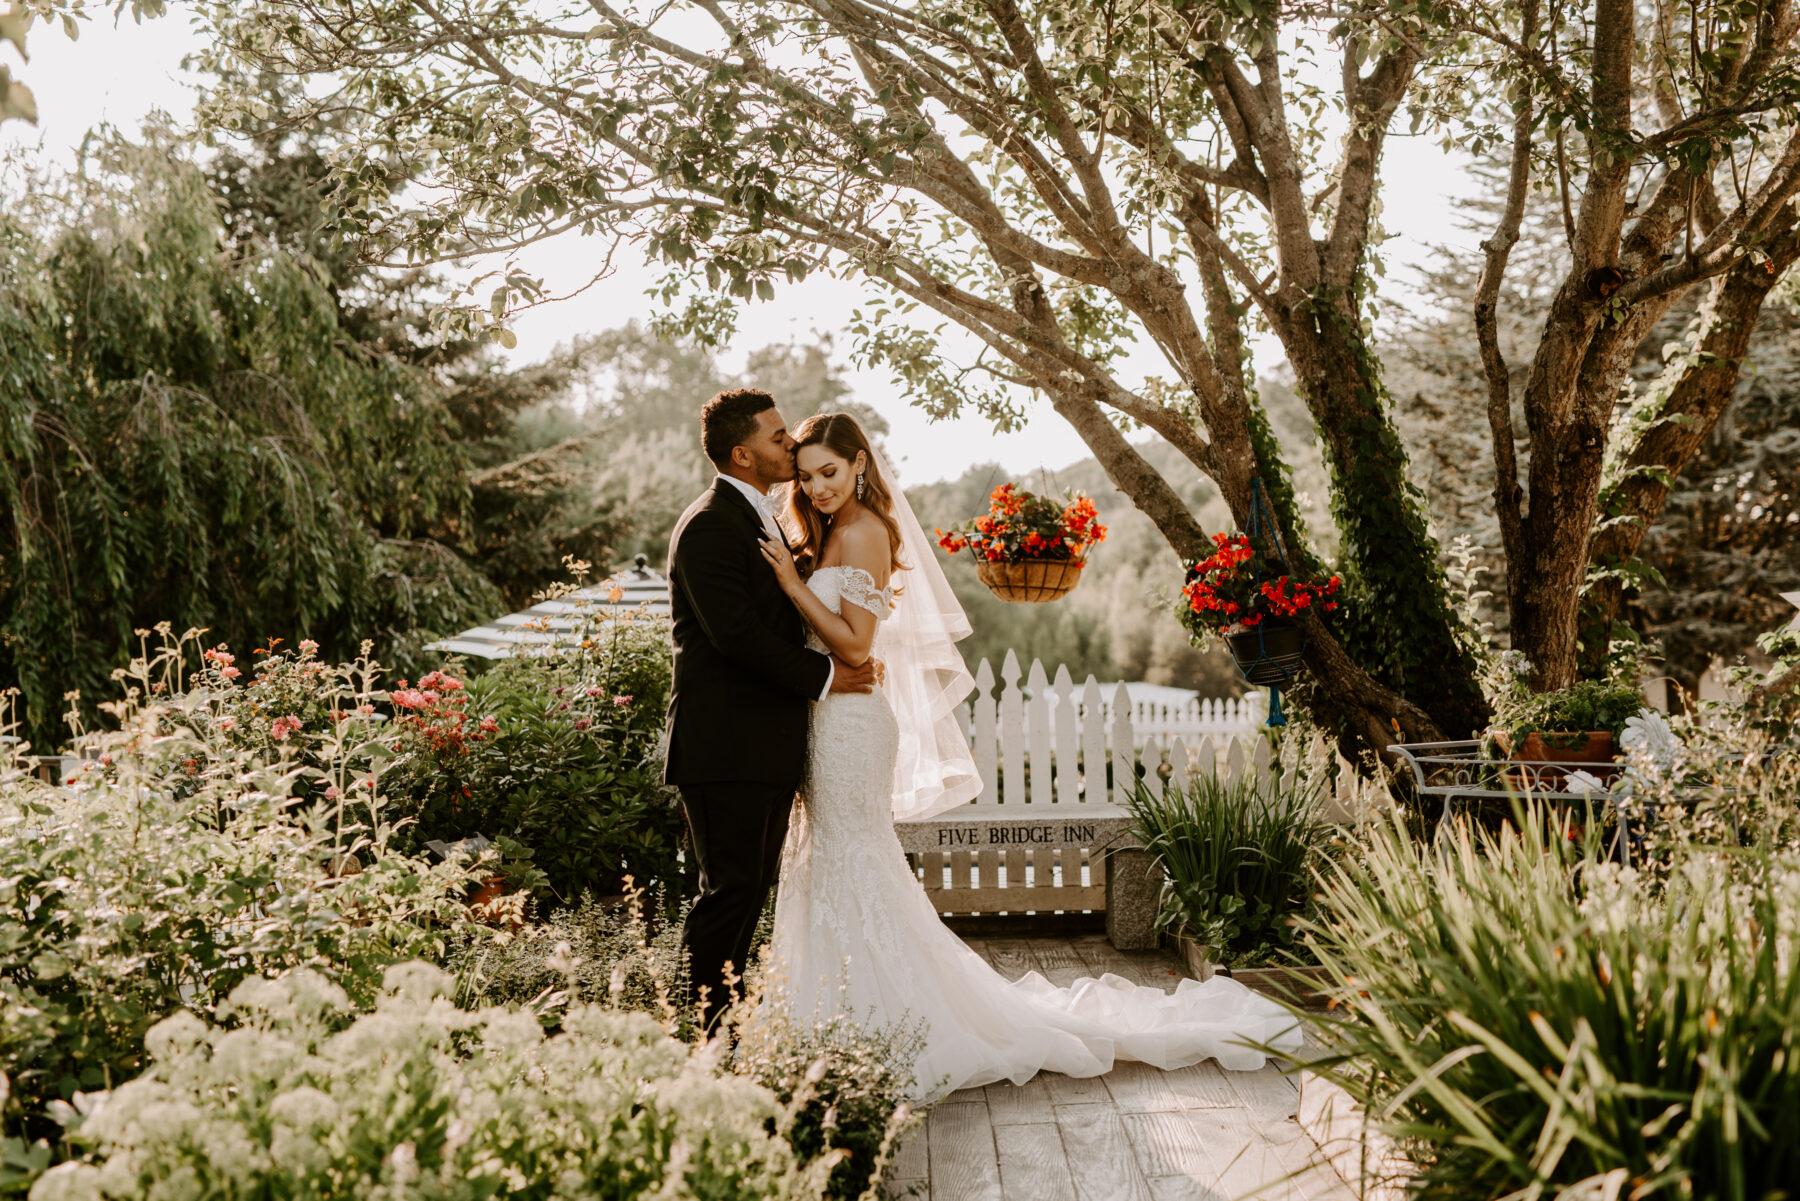 Five Bridge Inn Rehoboth Wedding Katie and Enrique Blueflash Photography 4